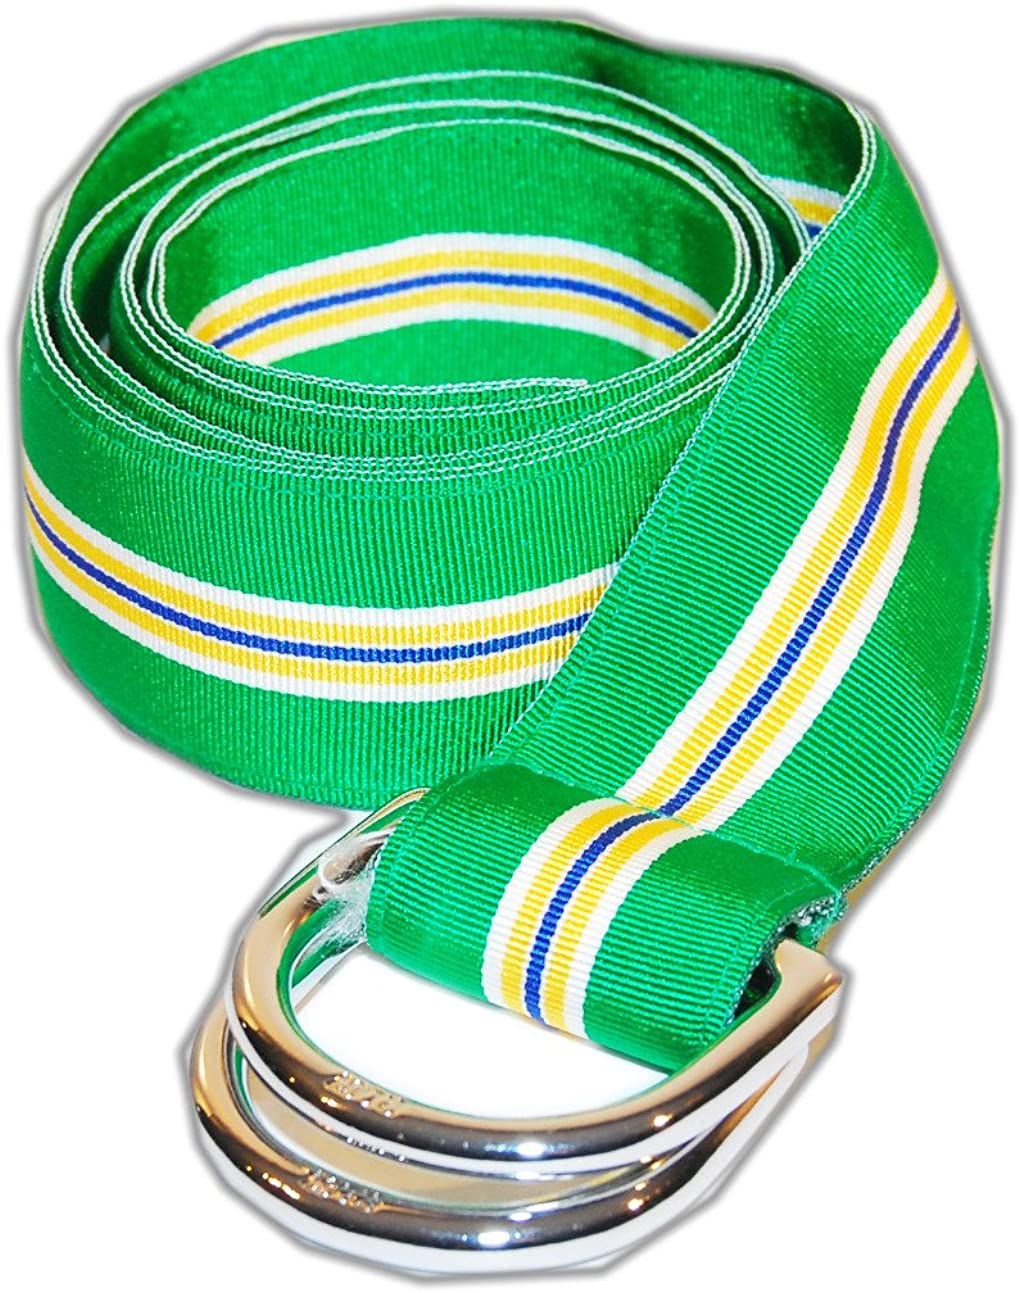 Polo Ralph Lauren Mens Grosgrain Spasm price Belt Max 70% OFF D-Ring Green Ribbon Yellow